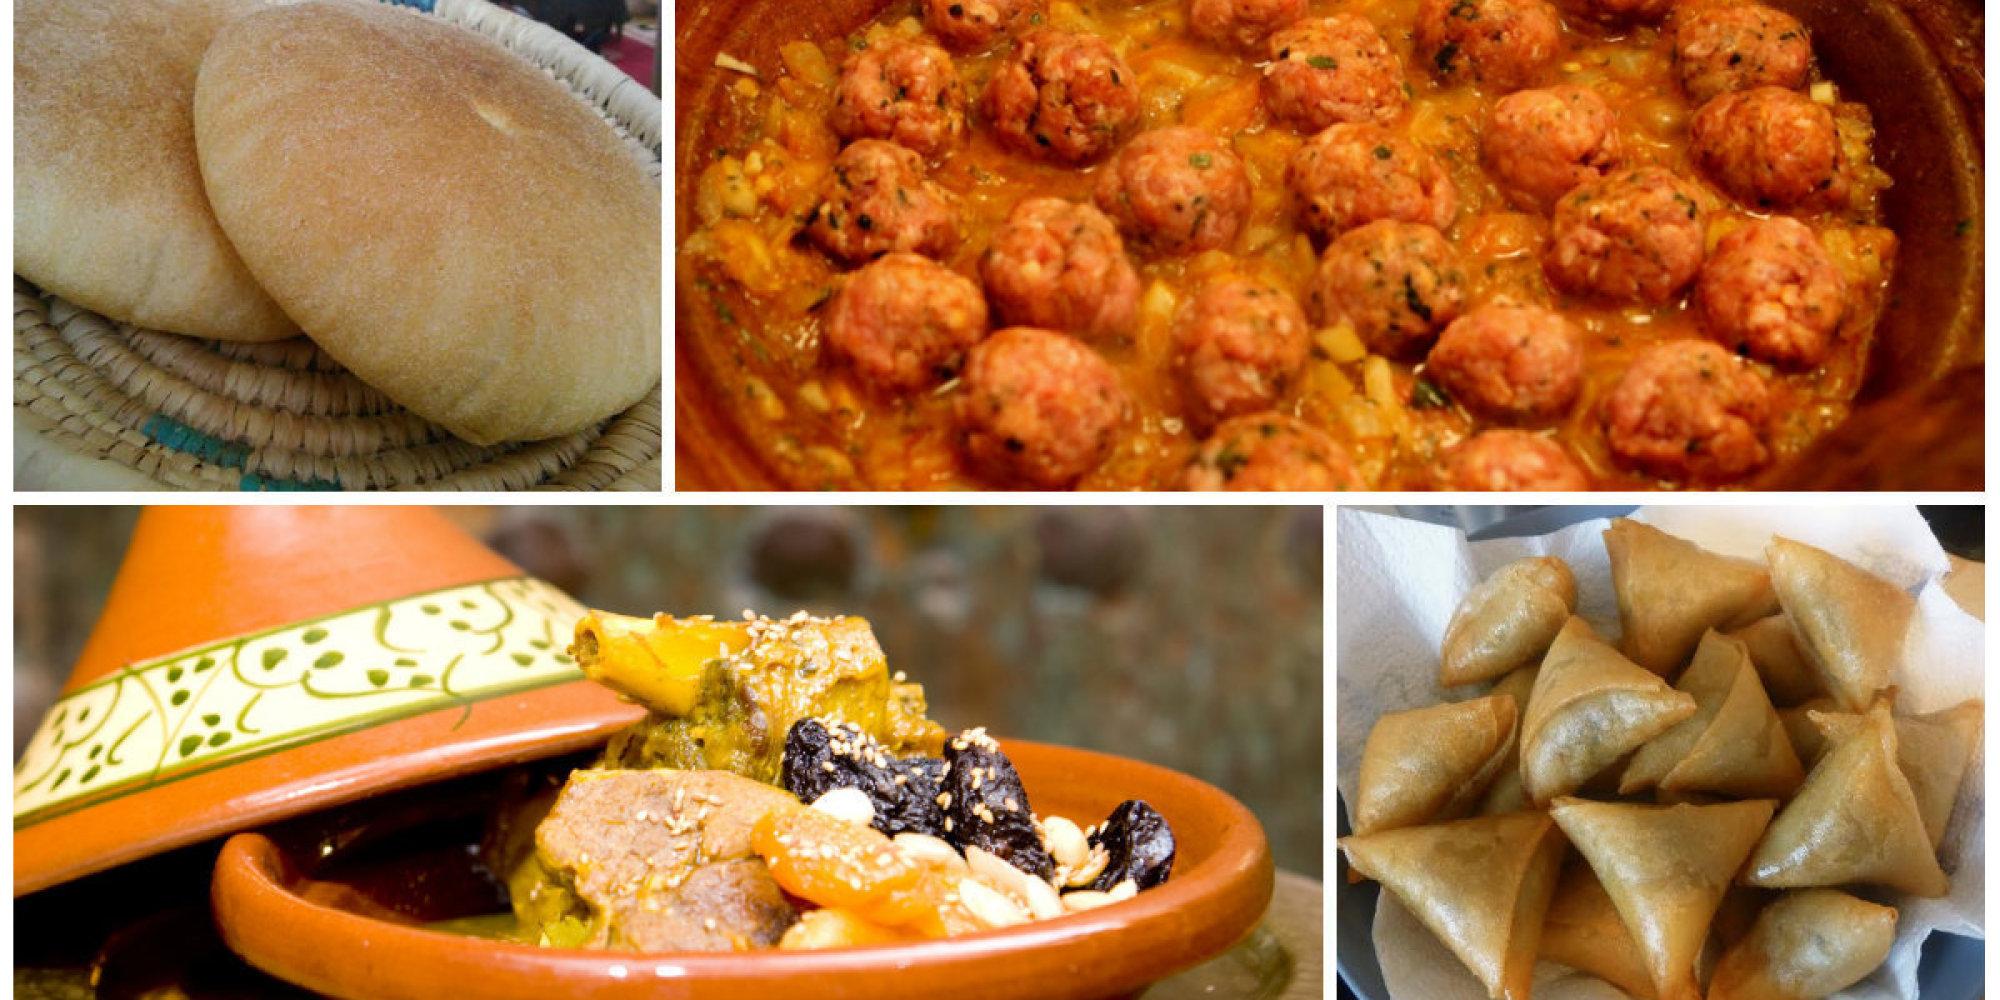 Decoration Cuisine Marocaine : Davaus decoration la cuisine marocaine avec des